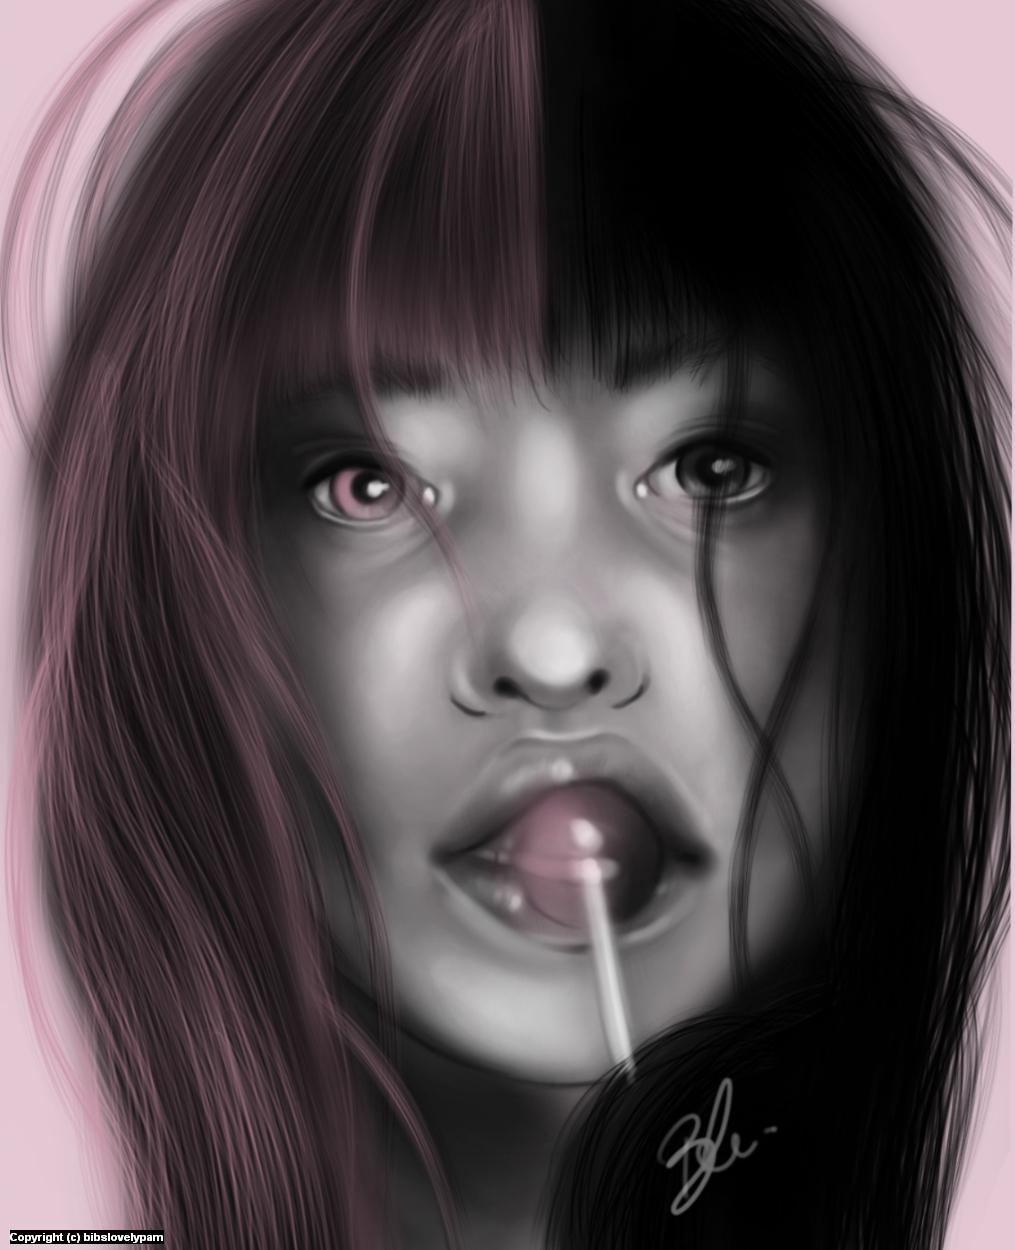 Lollipop Artwork by bibs lovelypam